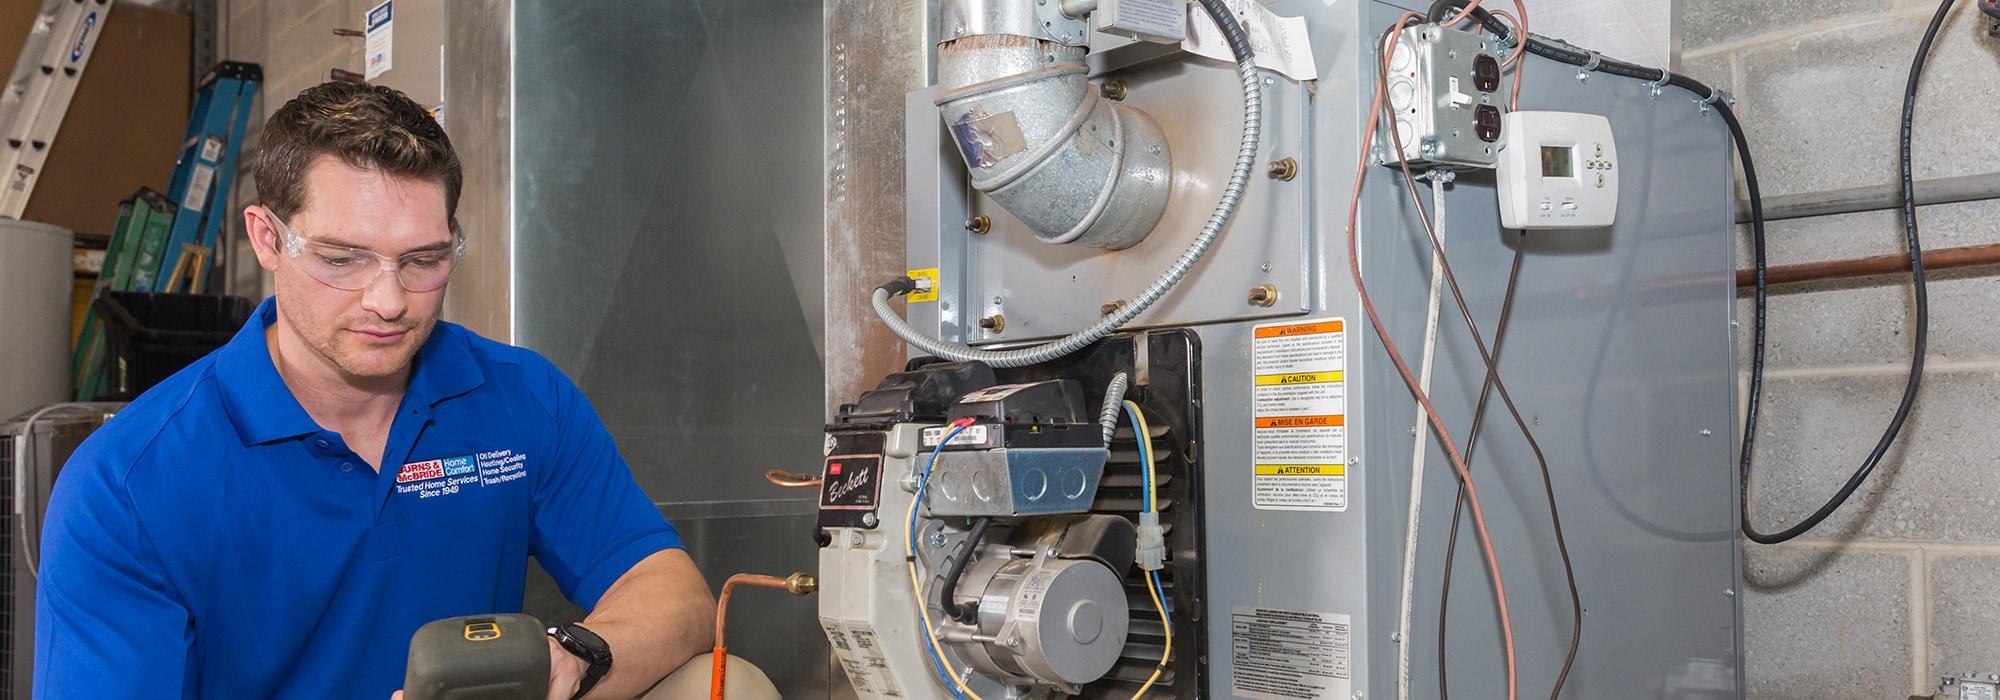 Burns & McBride technician servicing an HVAC unit in Wilmington, DE.